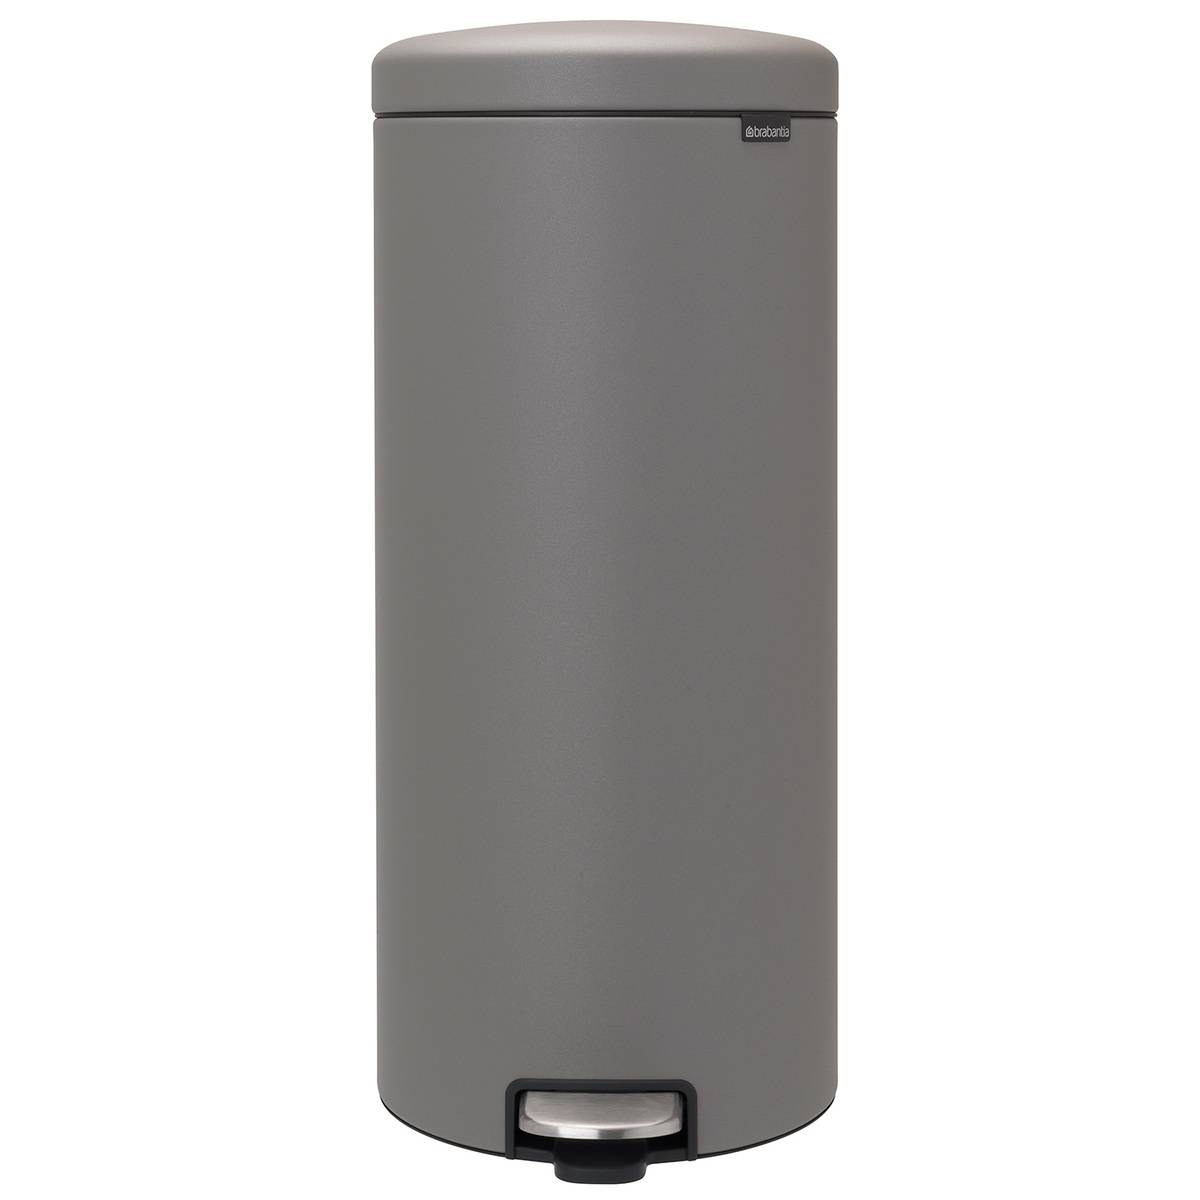 Brabantia newIcon poljinroska-astia 30 L, Sense of Luxury, harmaa